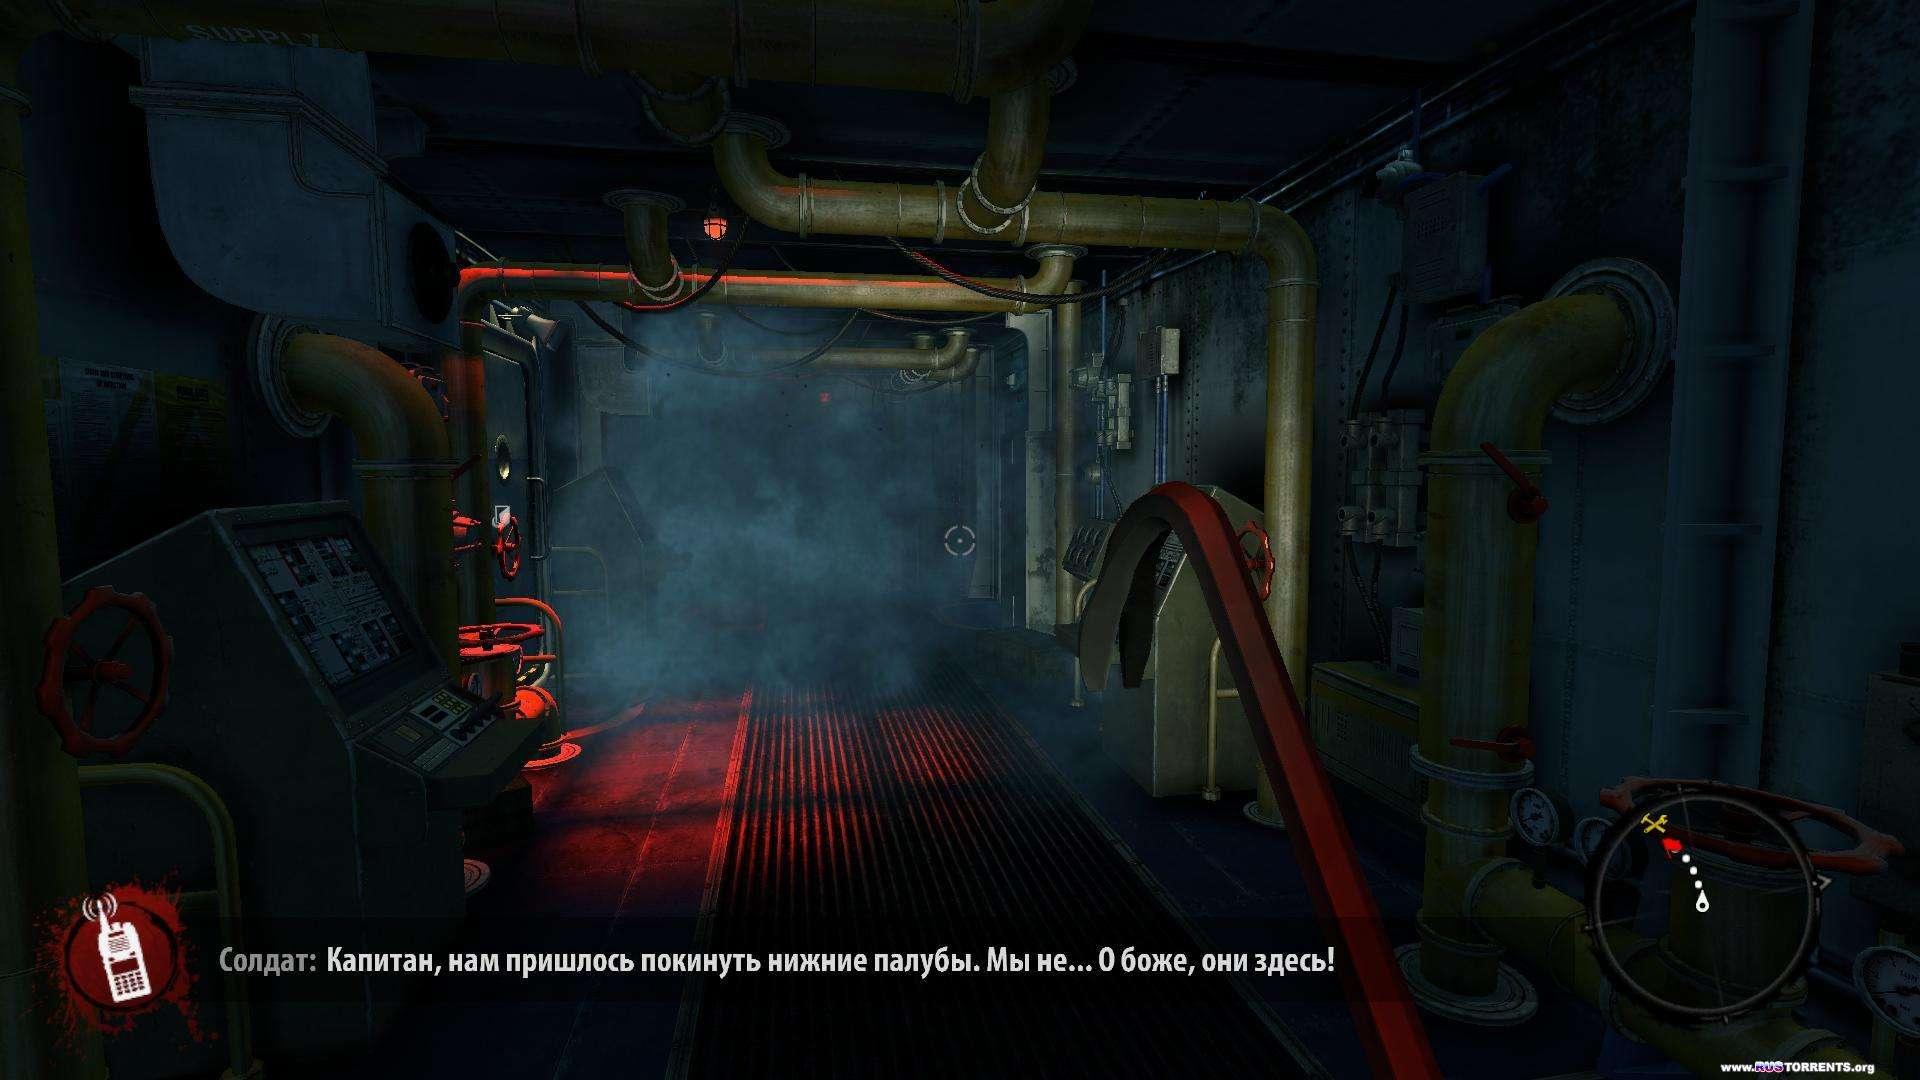 Dead Island: Riptide [v 1.4.1.1.13 + 2 DLC] | PC | Repack от R.G. Revenants